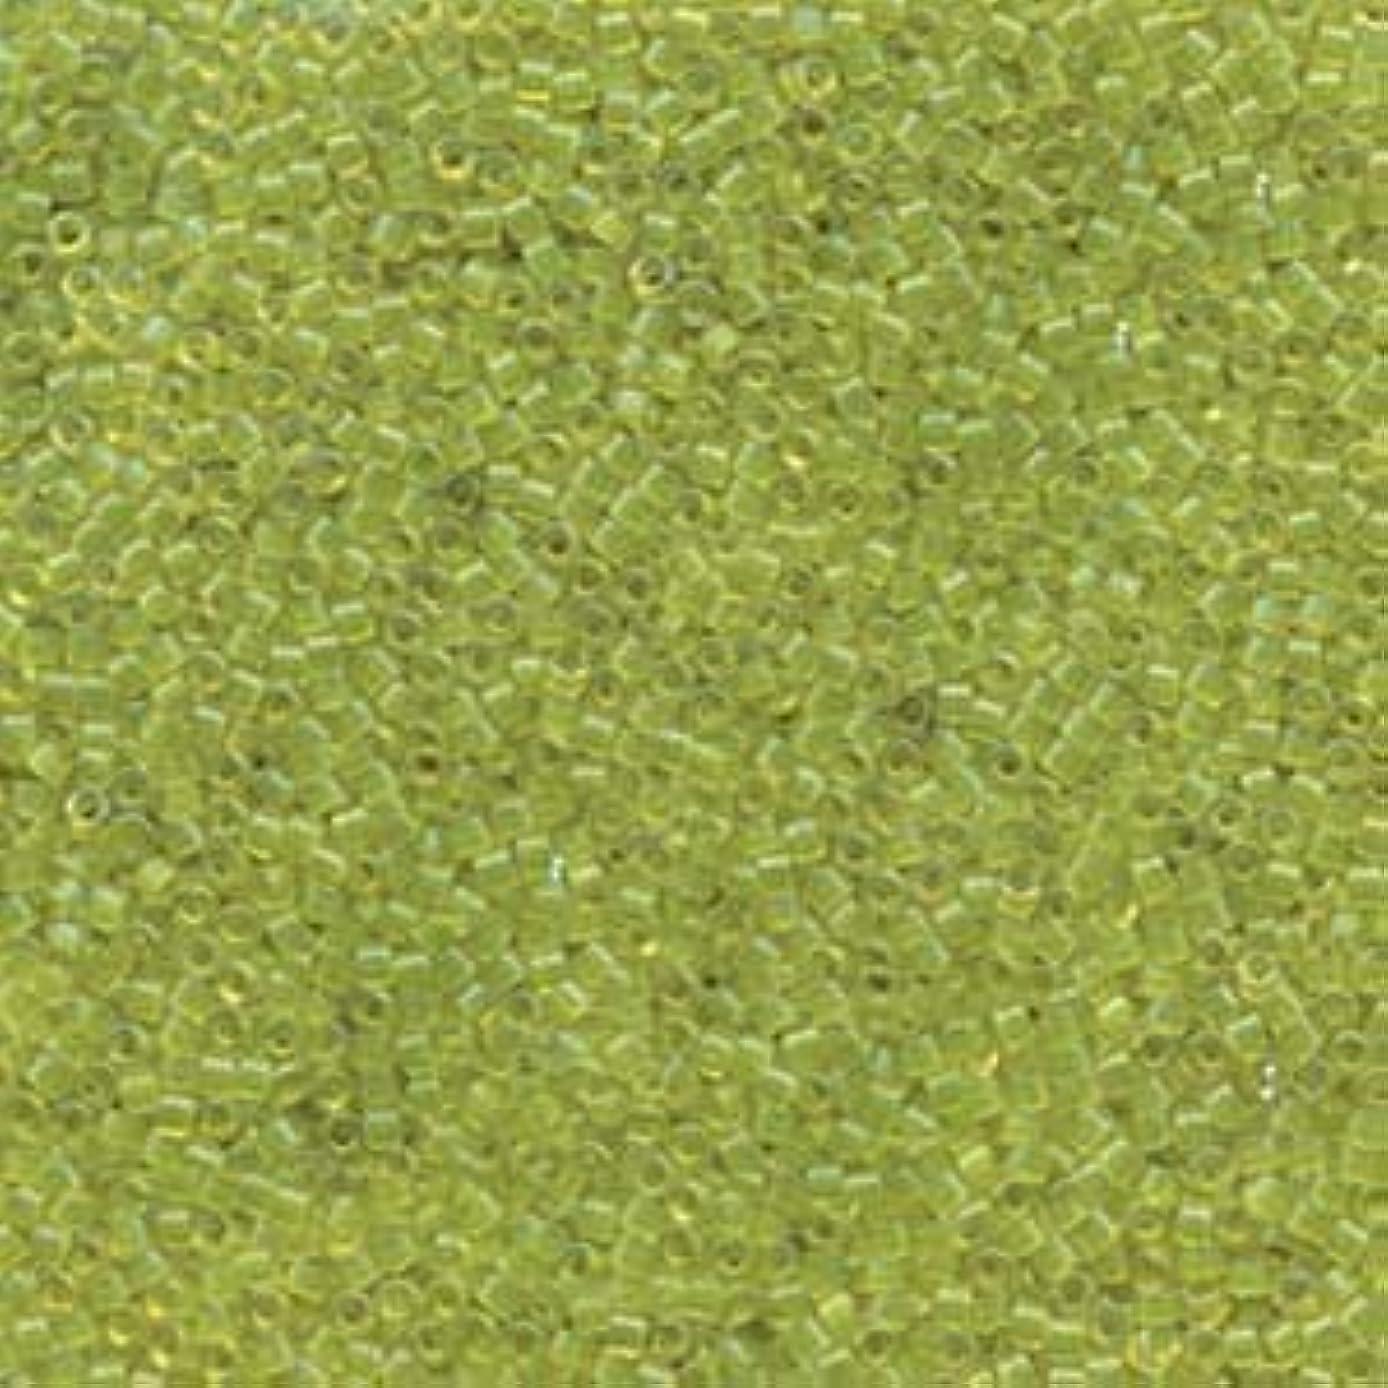 Miyuki Delica Seed Beads 11/0 Transparent Lime 7.2 Gram DB1106